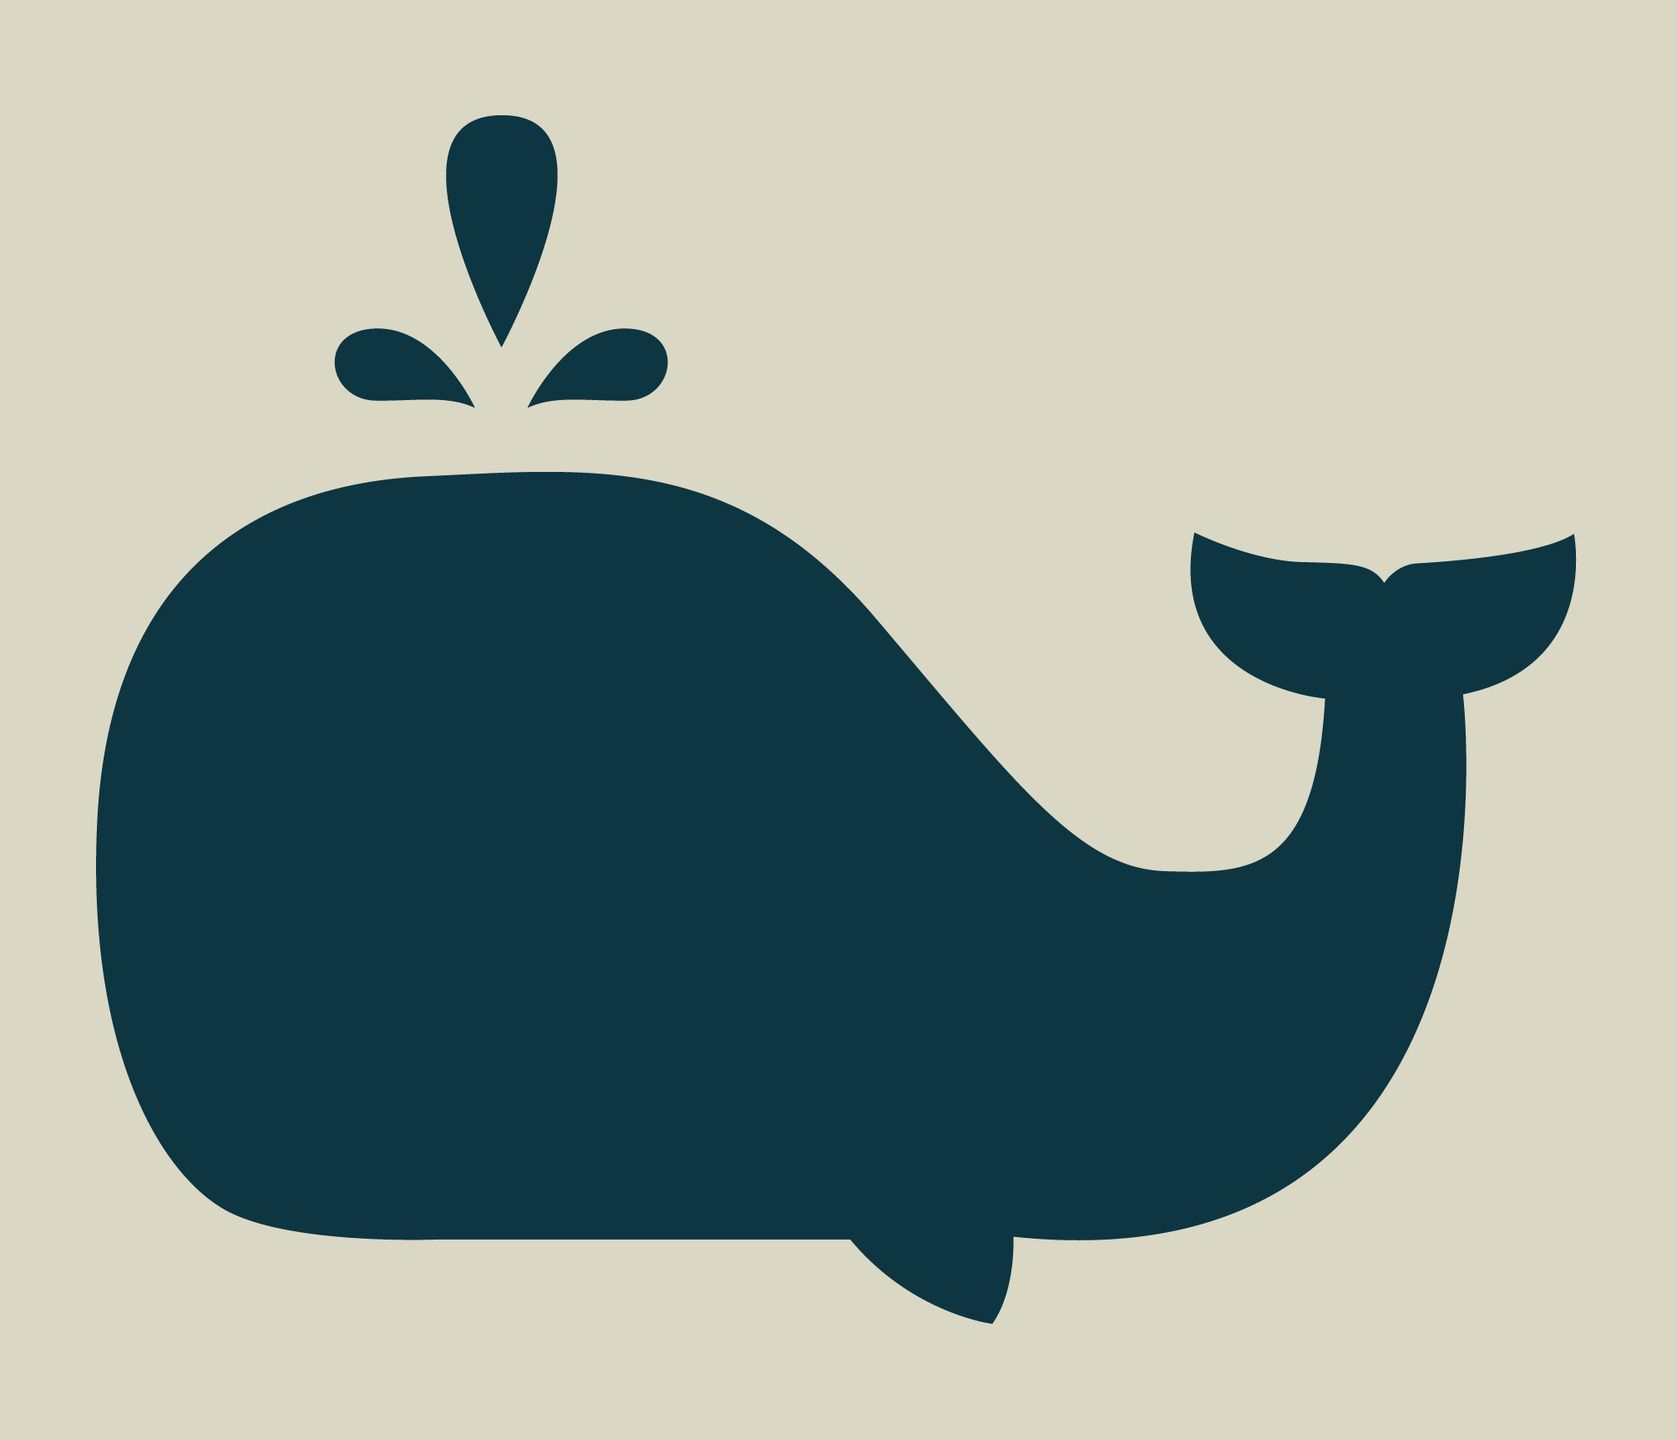 Baleine pochoir de baleine pochoir en vinyle adh sif for Pochoir pour miroir